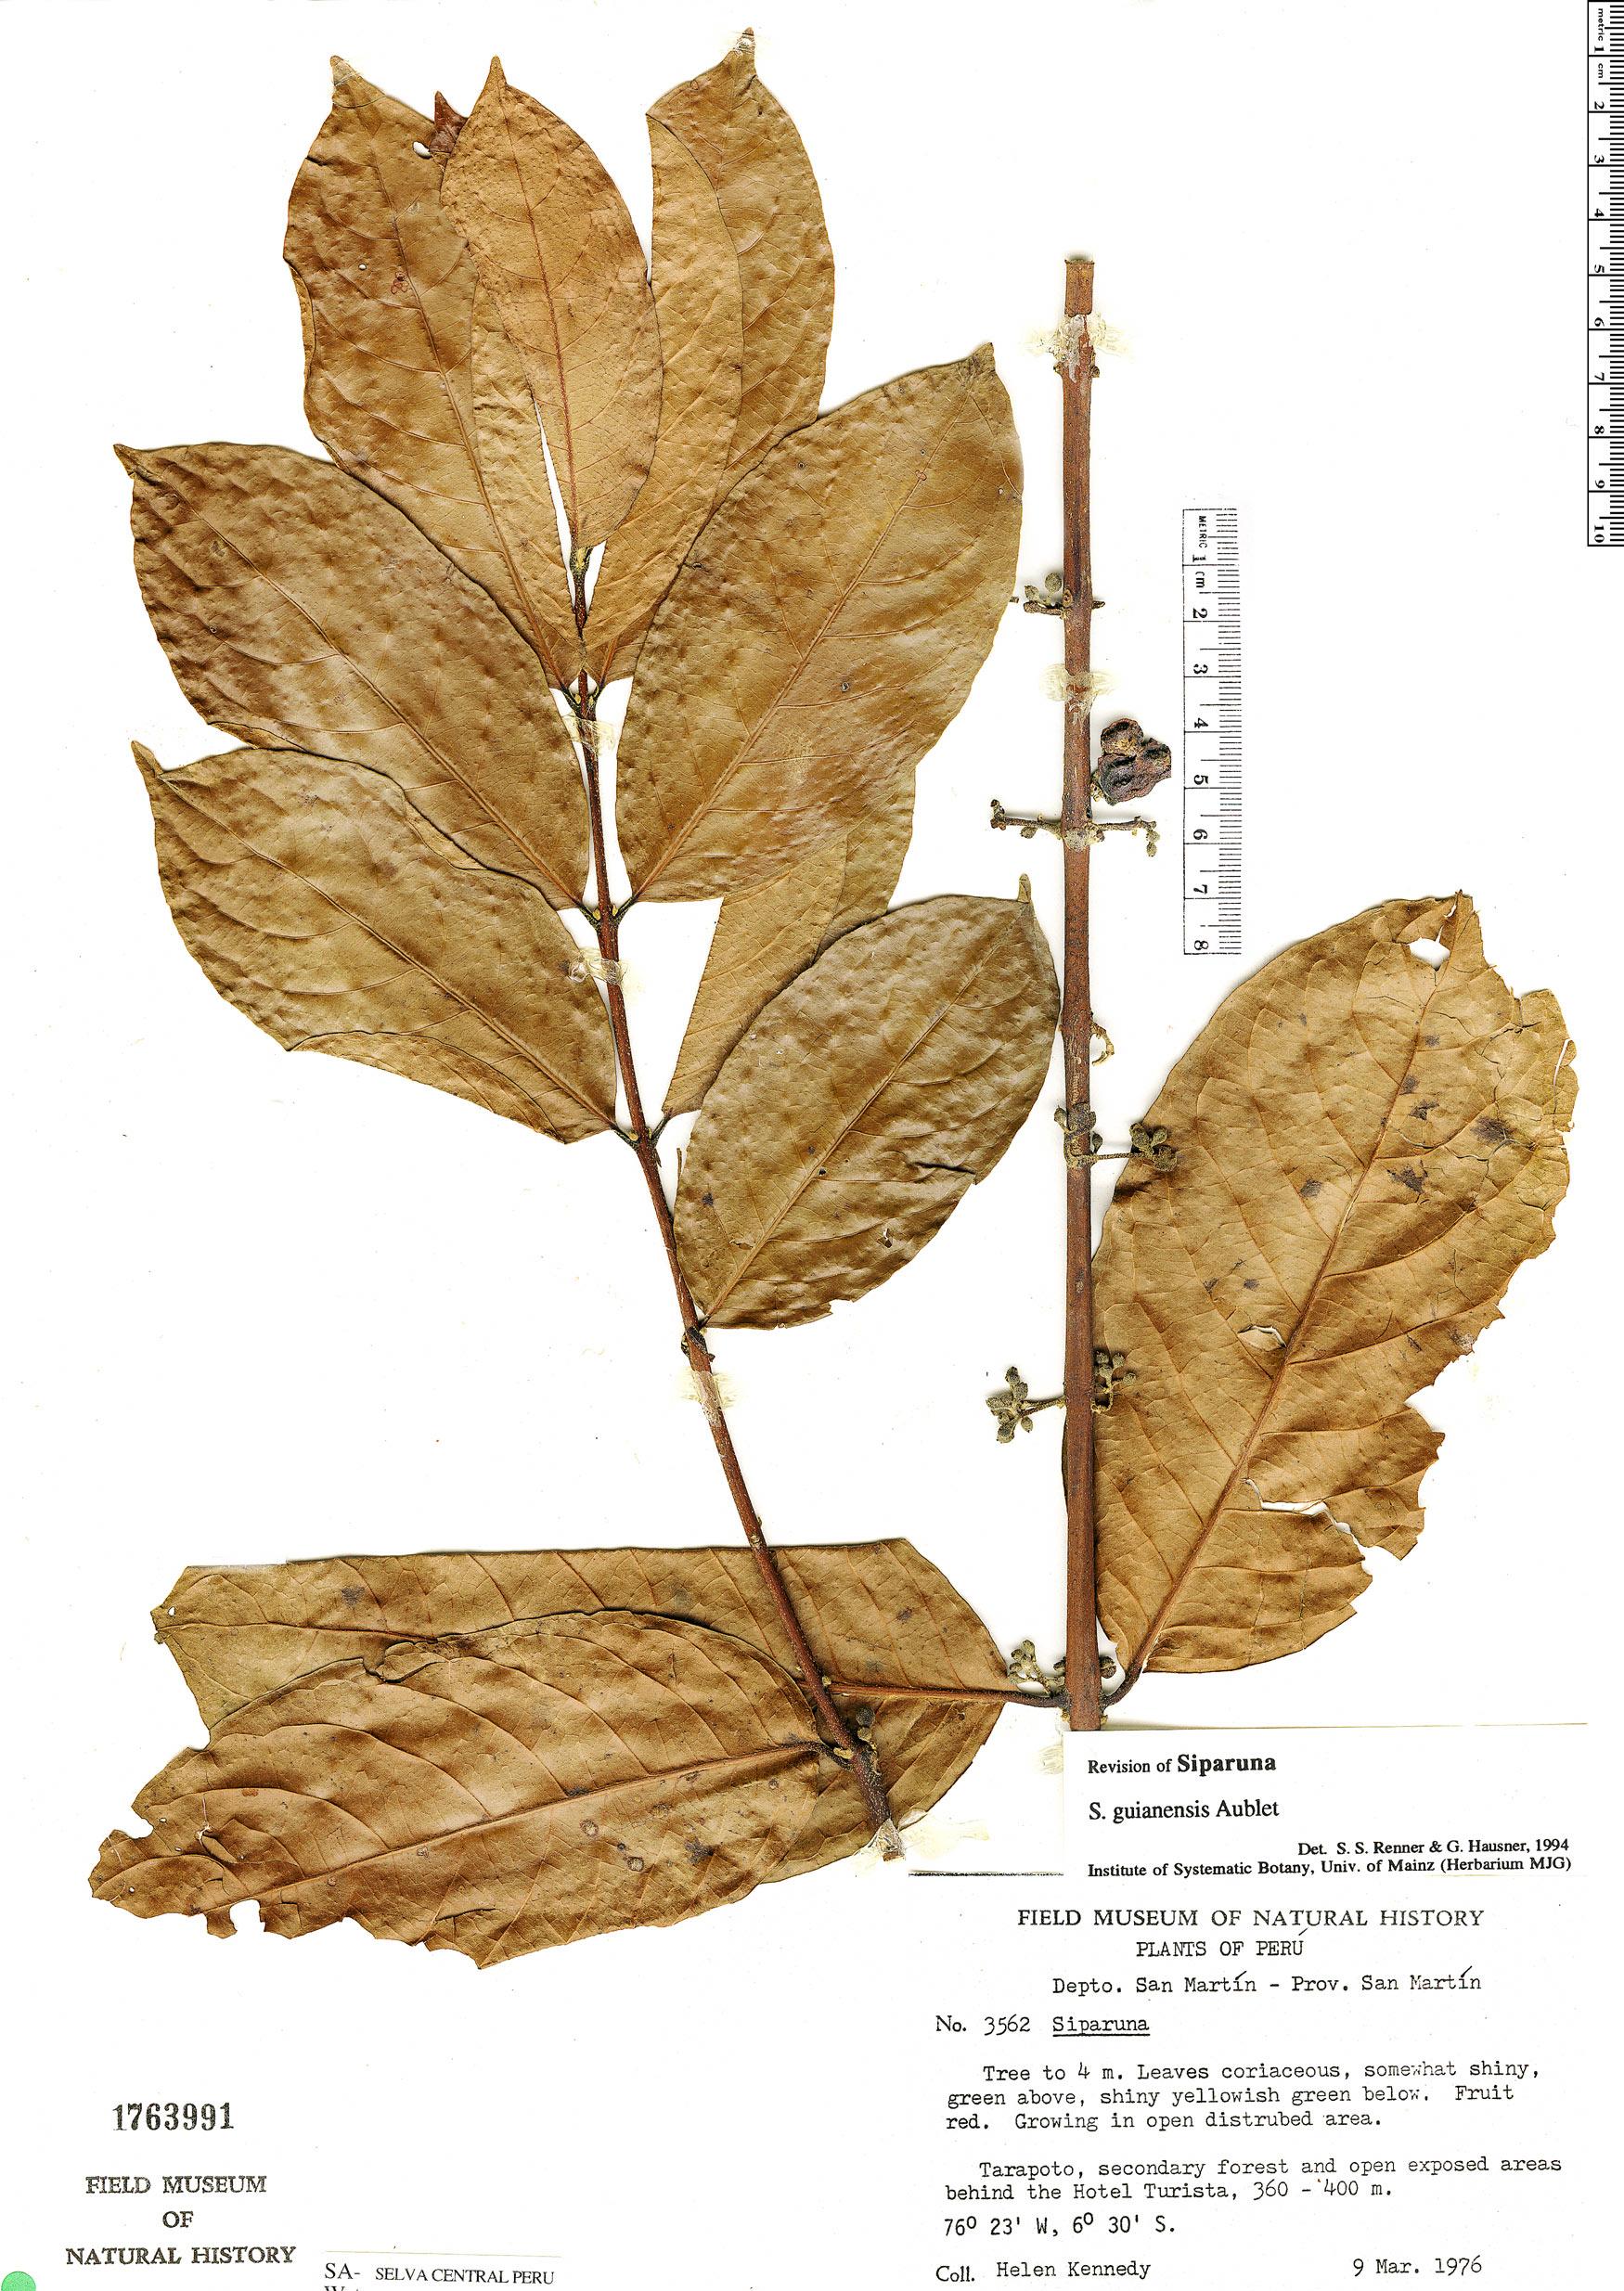 Specimen: Siparuna guianensis